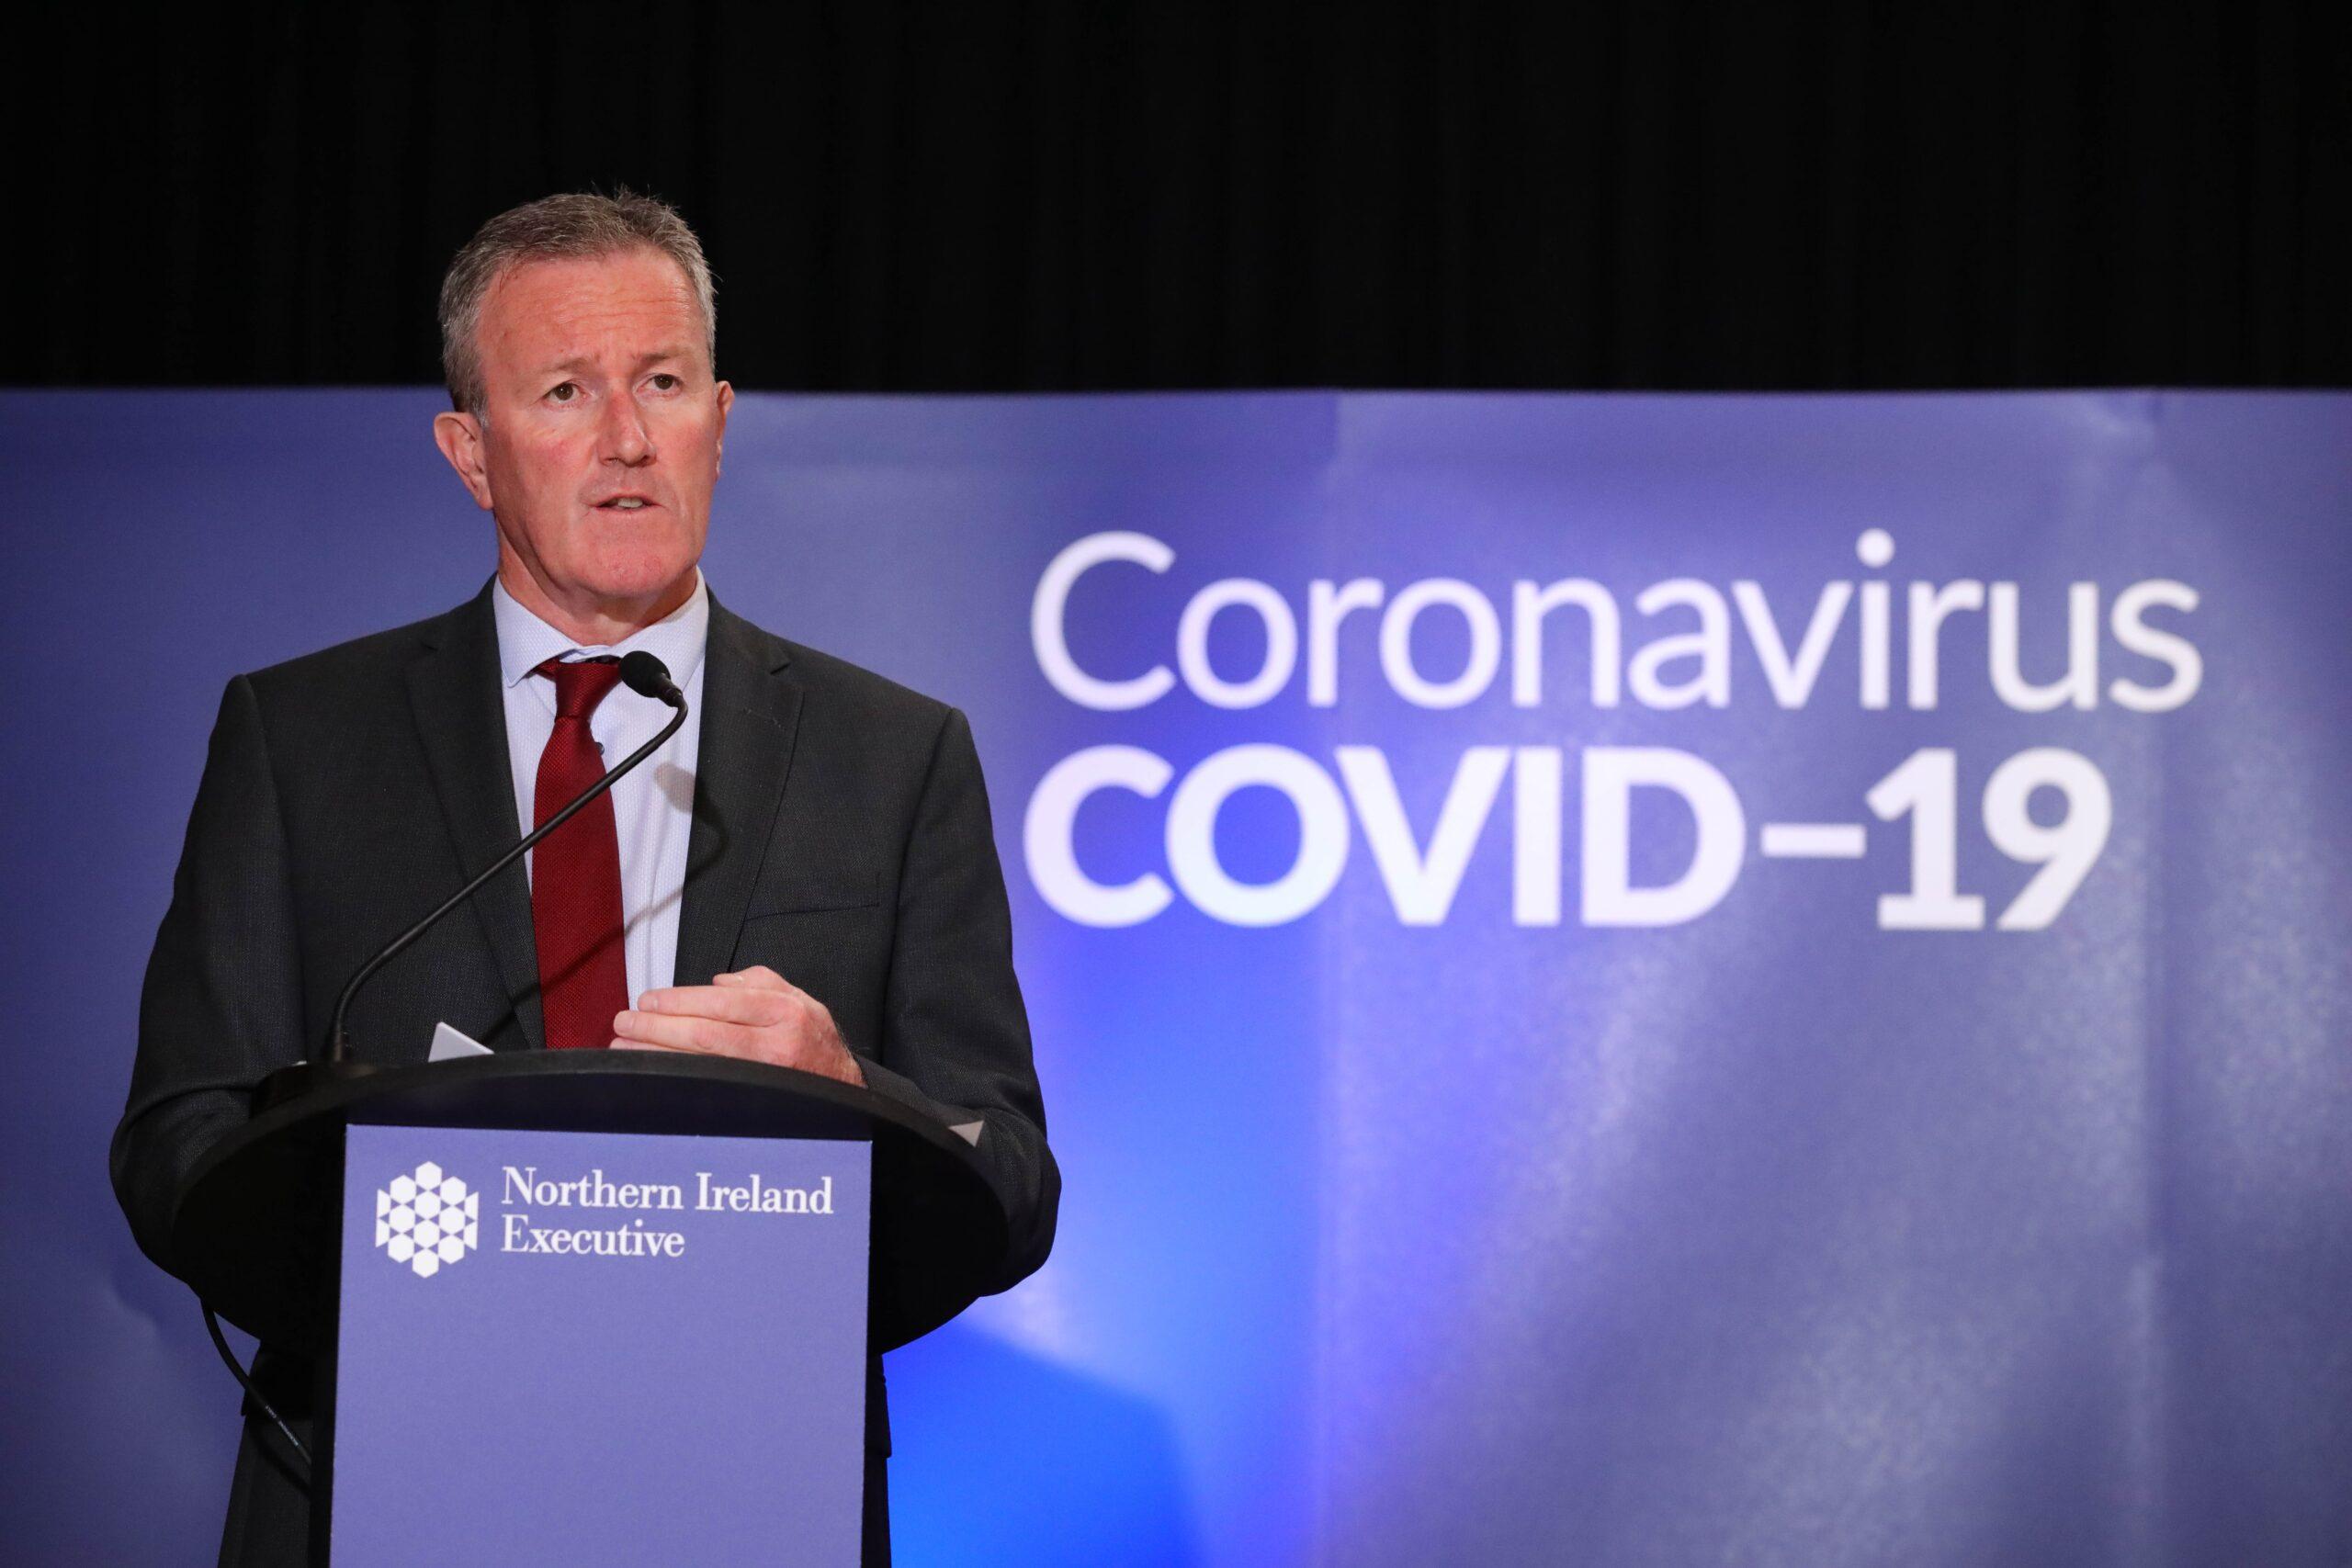 NI Coronavirus Grant Scheme - Finance Minister announces grant scheme for hospitality businesses - COVID-19 NI Coronavirus - NI business news - Freelance Belfast Copywriter Tall Paul Marketing